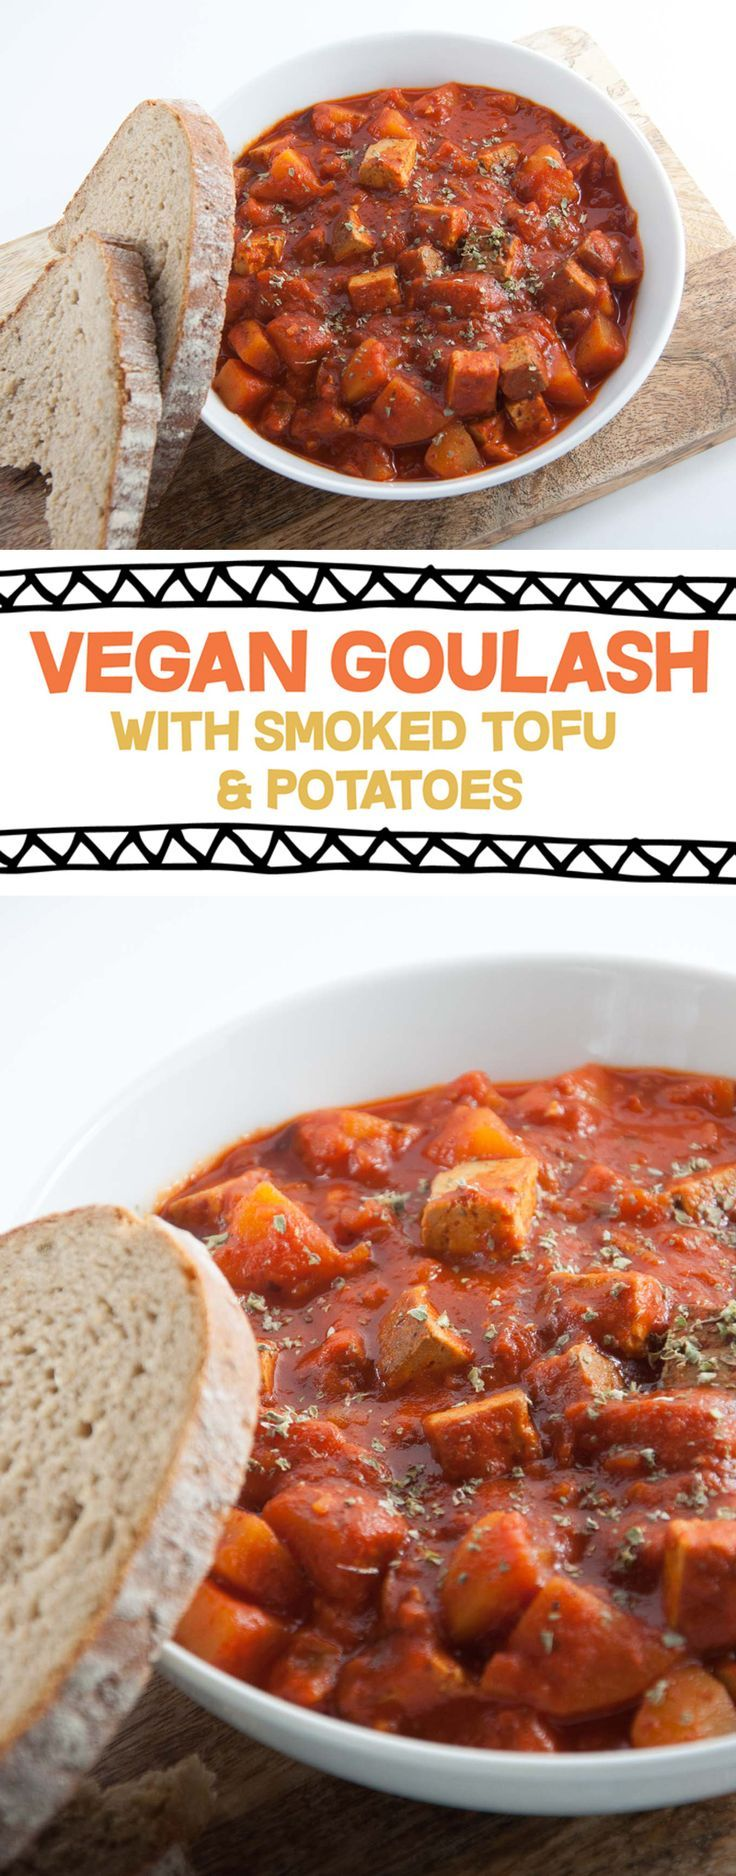 Vegan Goulash with Smoked Tofu and Potatoes